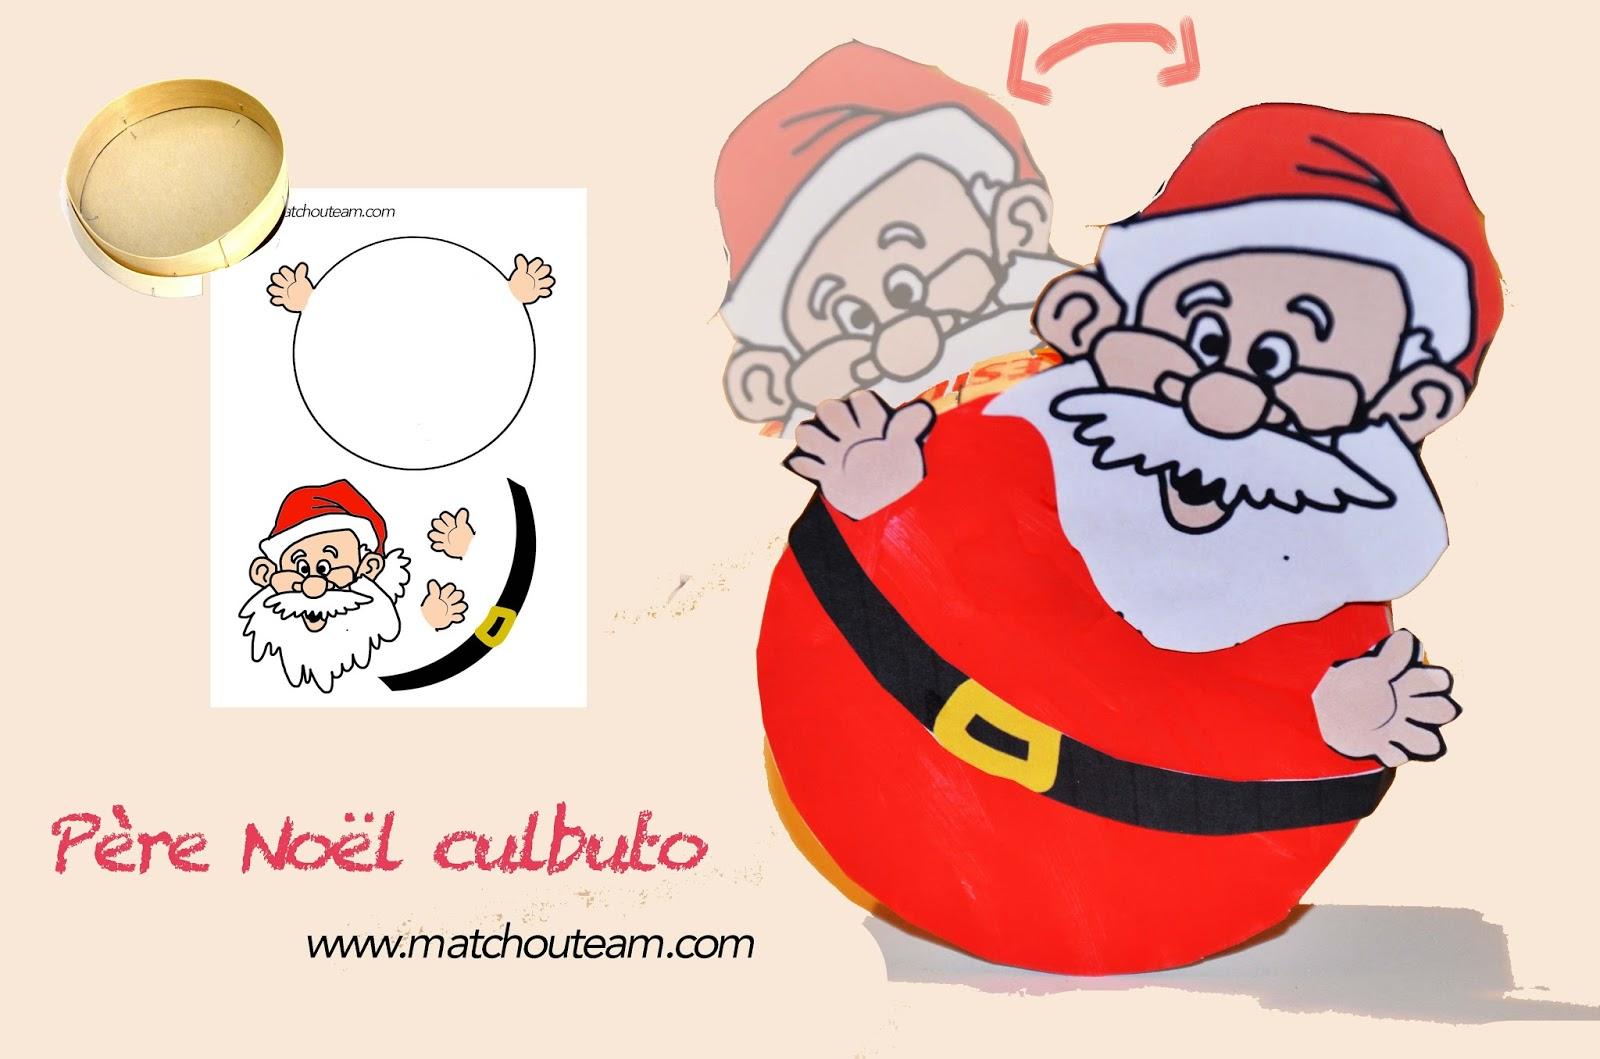 #C0100B Ma Tchou Team: Père Noël Culbuto 5519 décorations de noel tête à modeler 1600x1059 px @ aertt.com